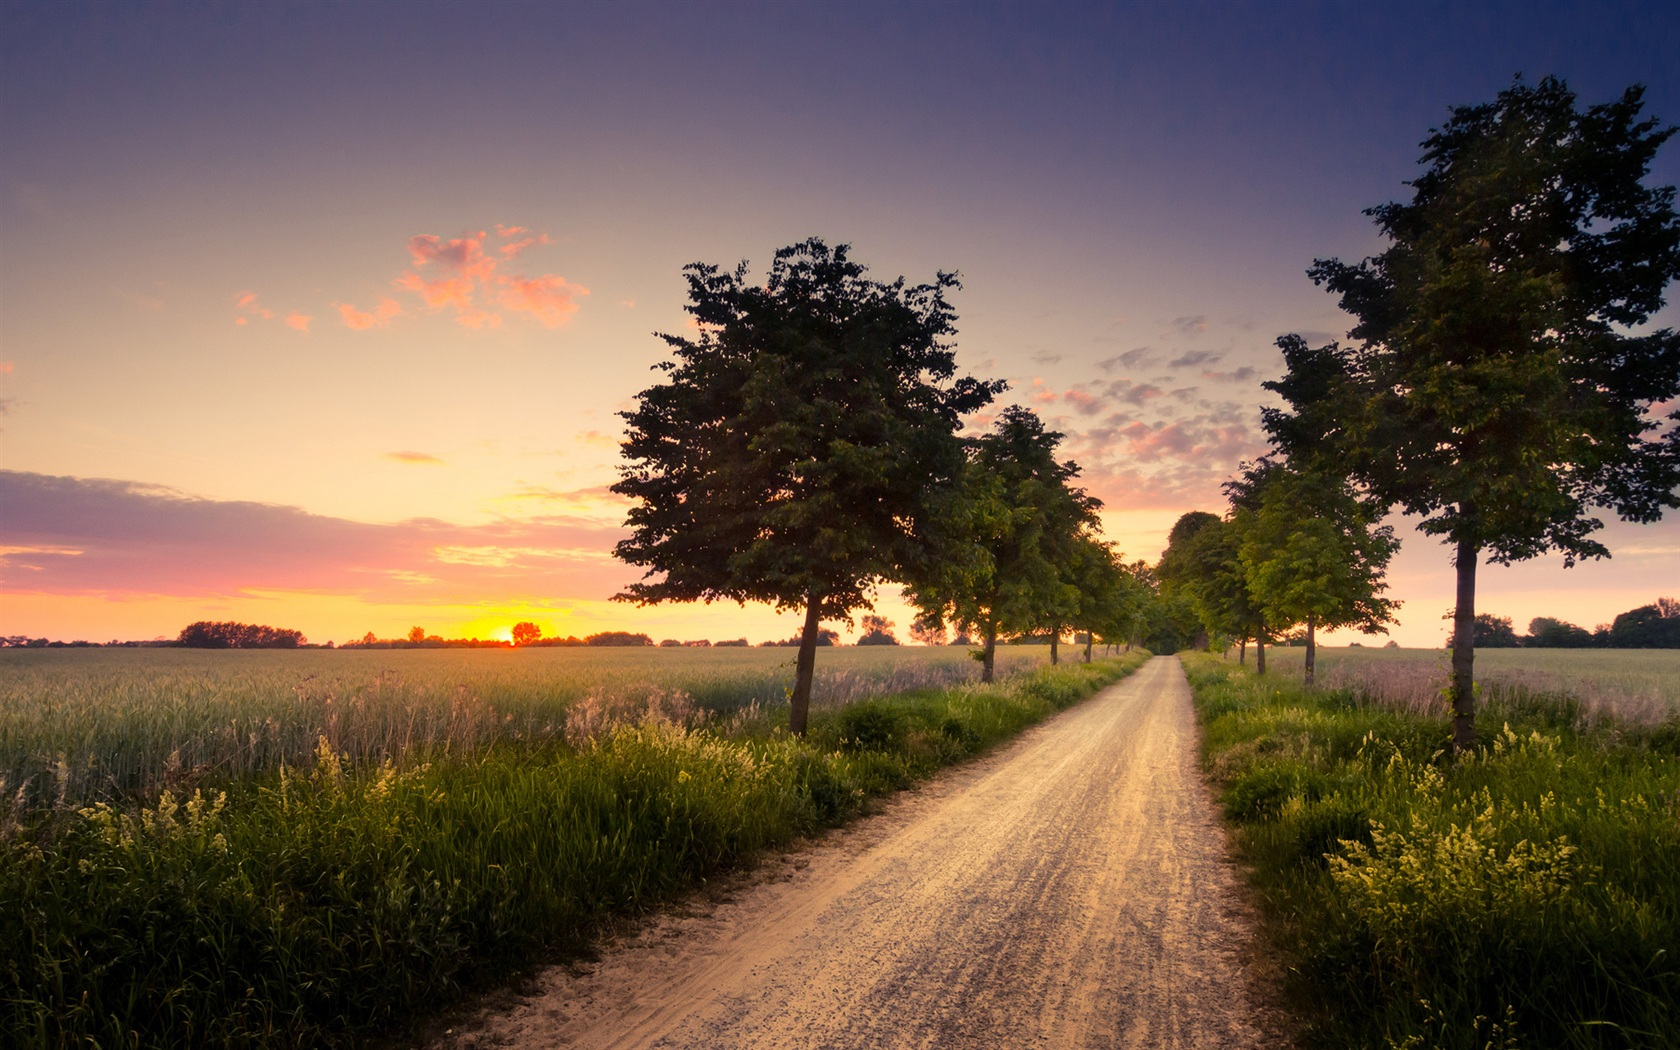 wallpaper tree field road landscape at sunset 1920x1200 hd